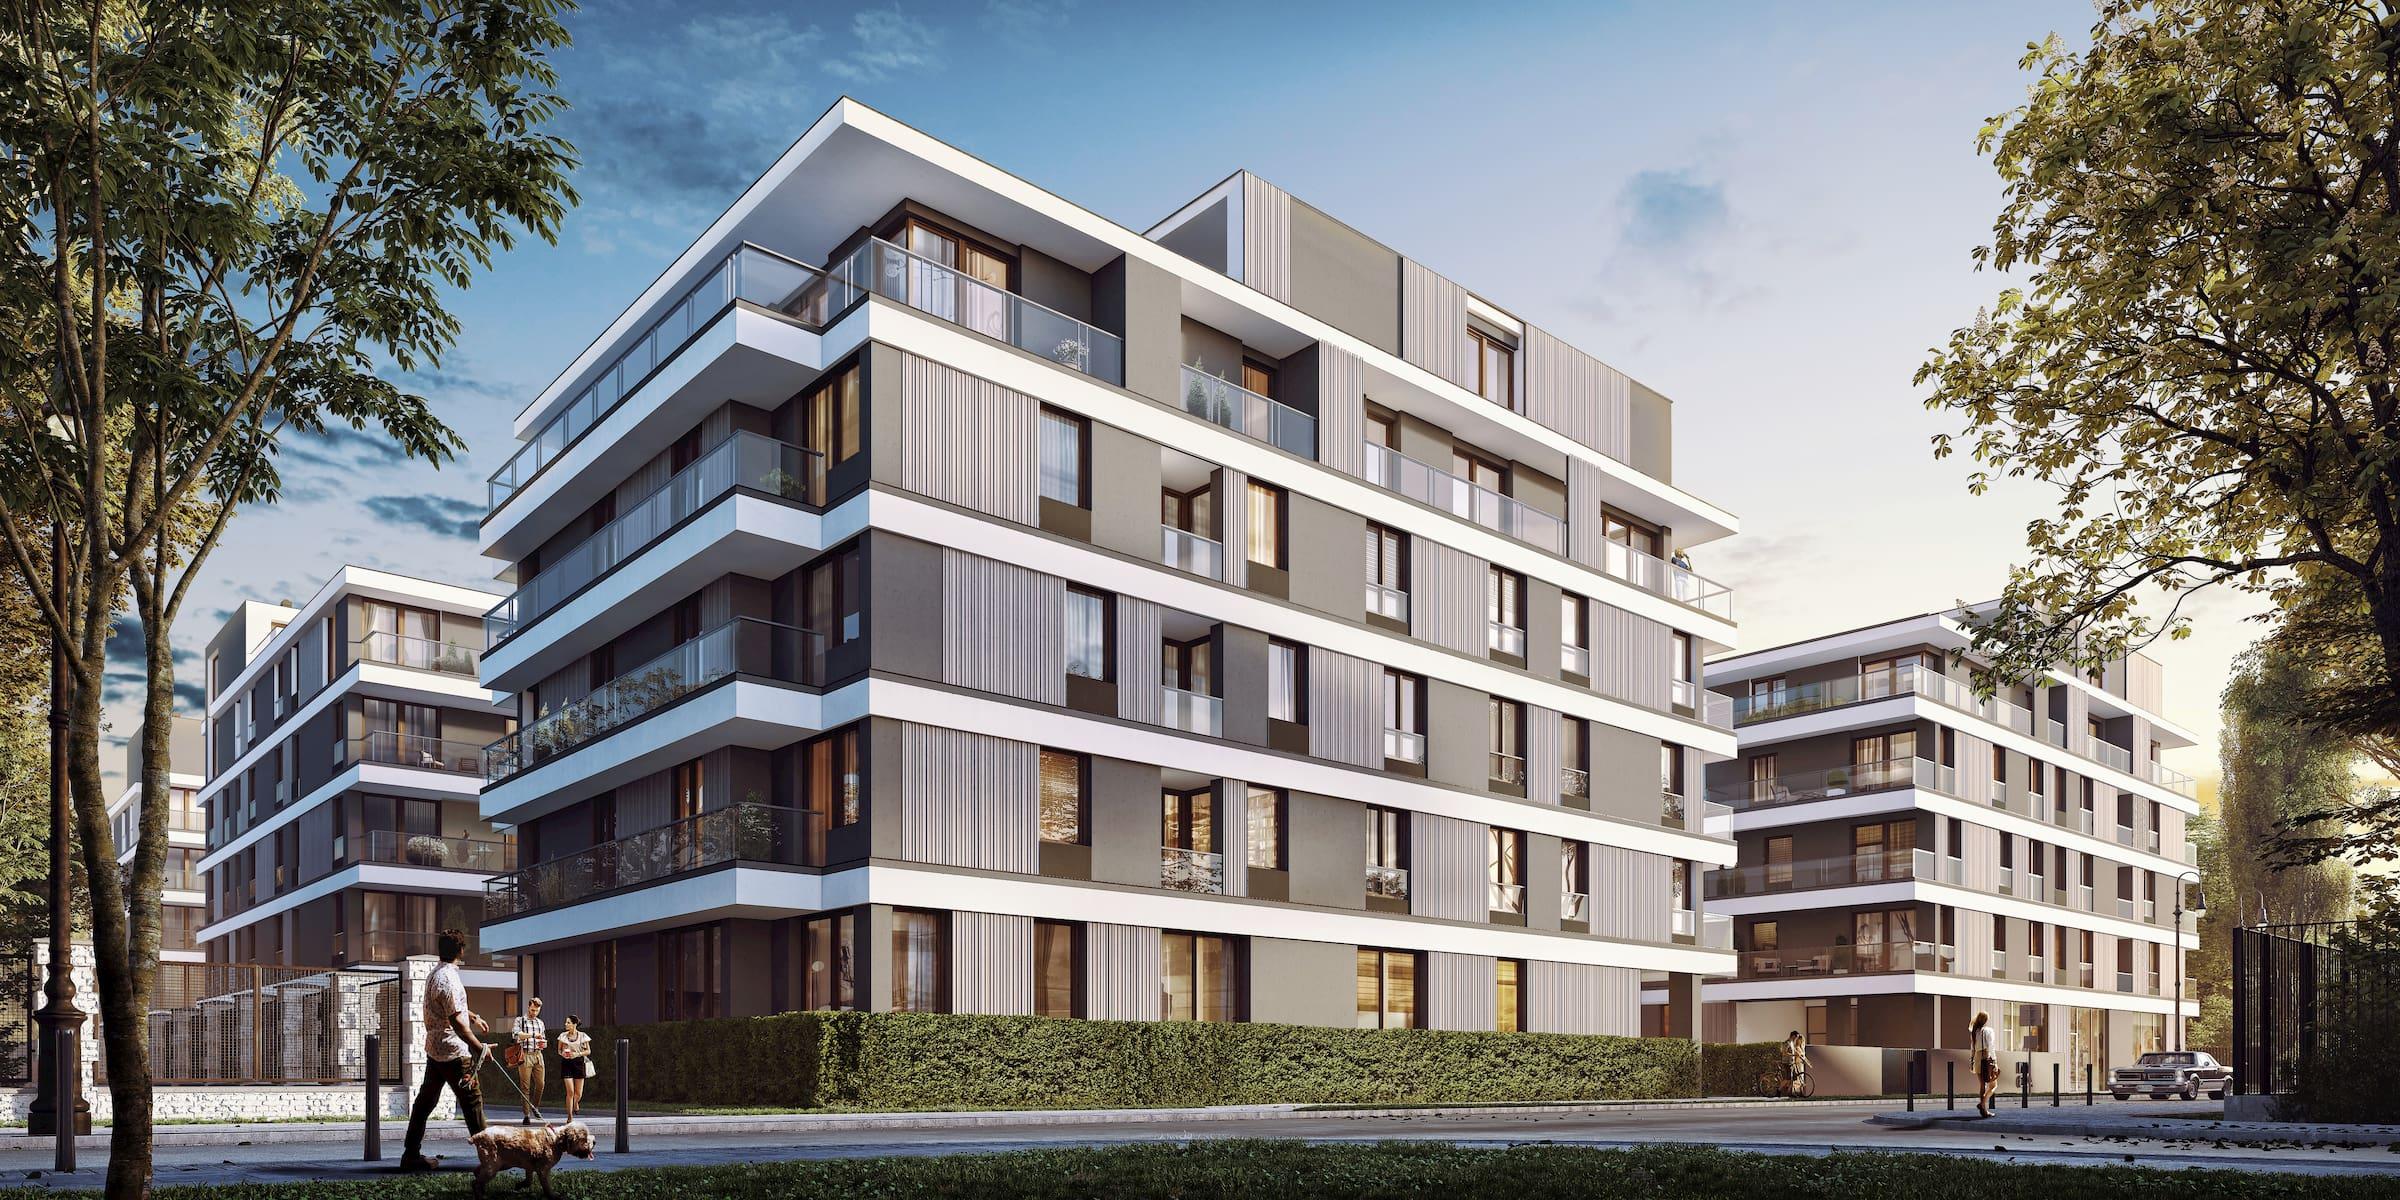 Housing estate in Warsaw Yareal Maas Projekt 2019